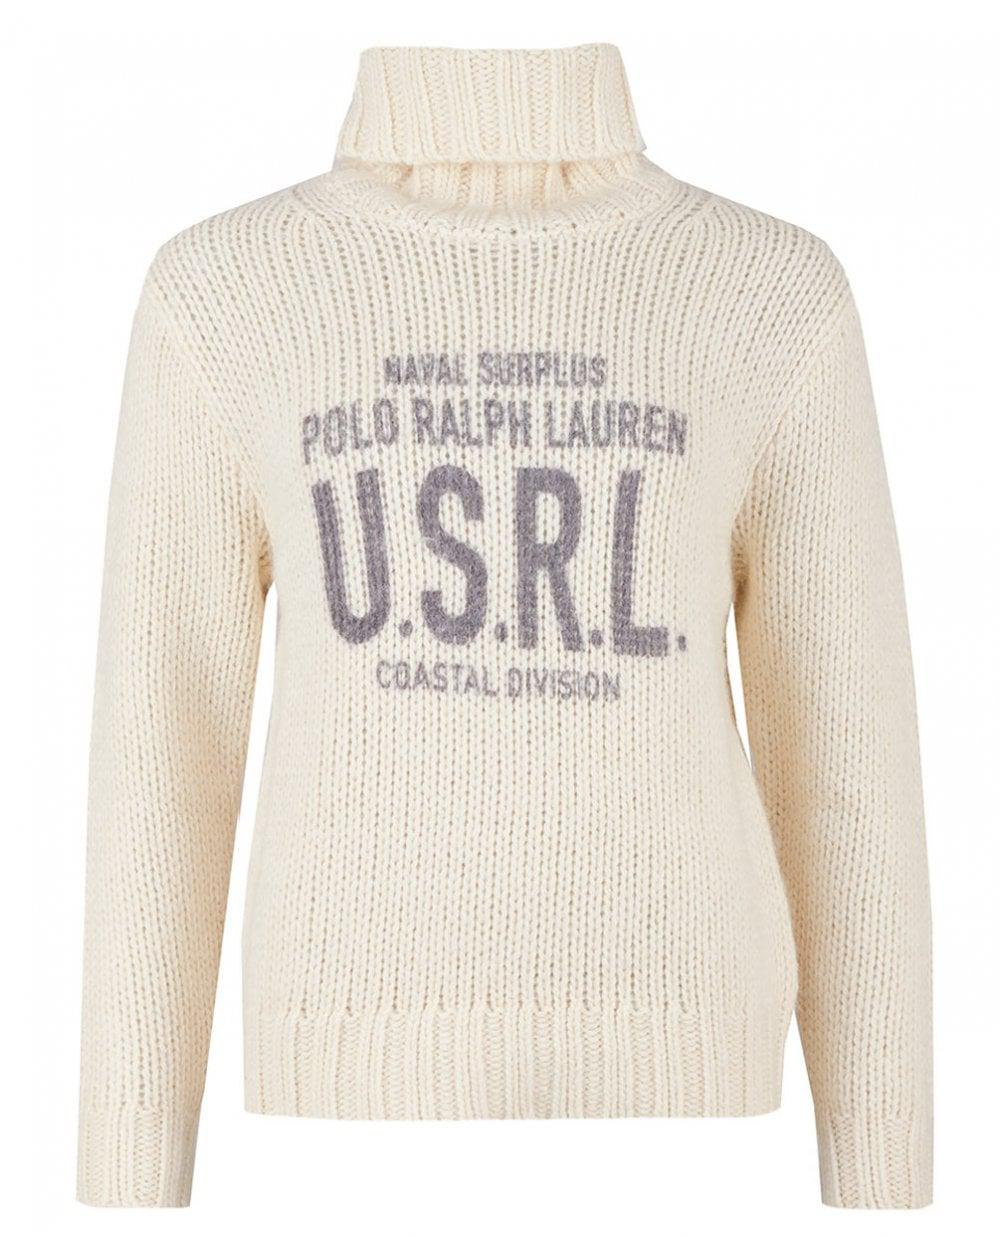 Polo Ralph Lauren - Natural Graphic Roll Neck Long Sleeved Knit - Lyst.  View fullscreen a7692e2ee199